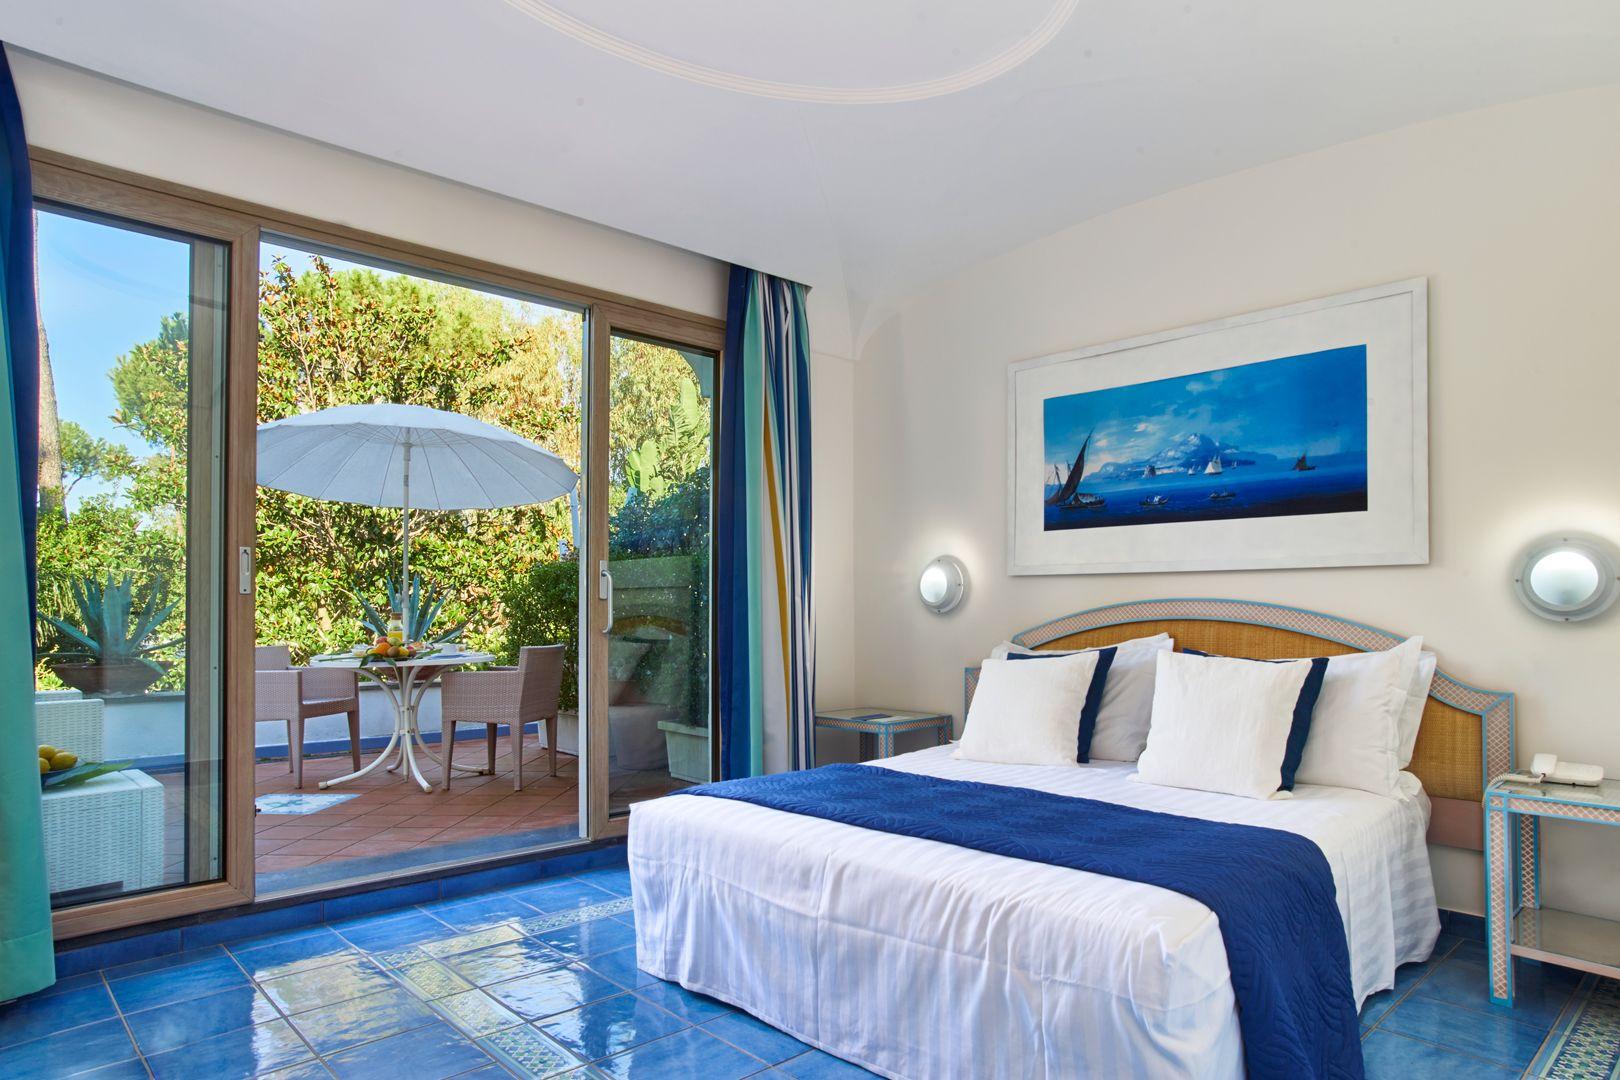 Hotel-central-park-ischia-20